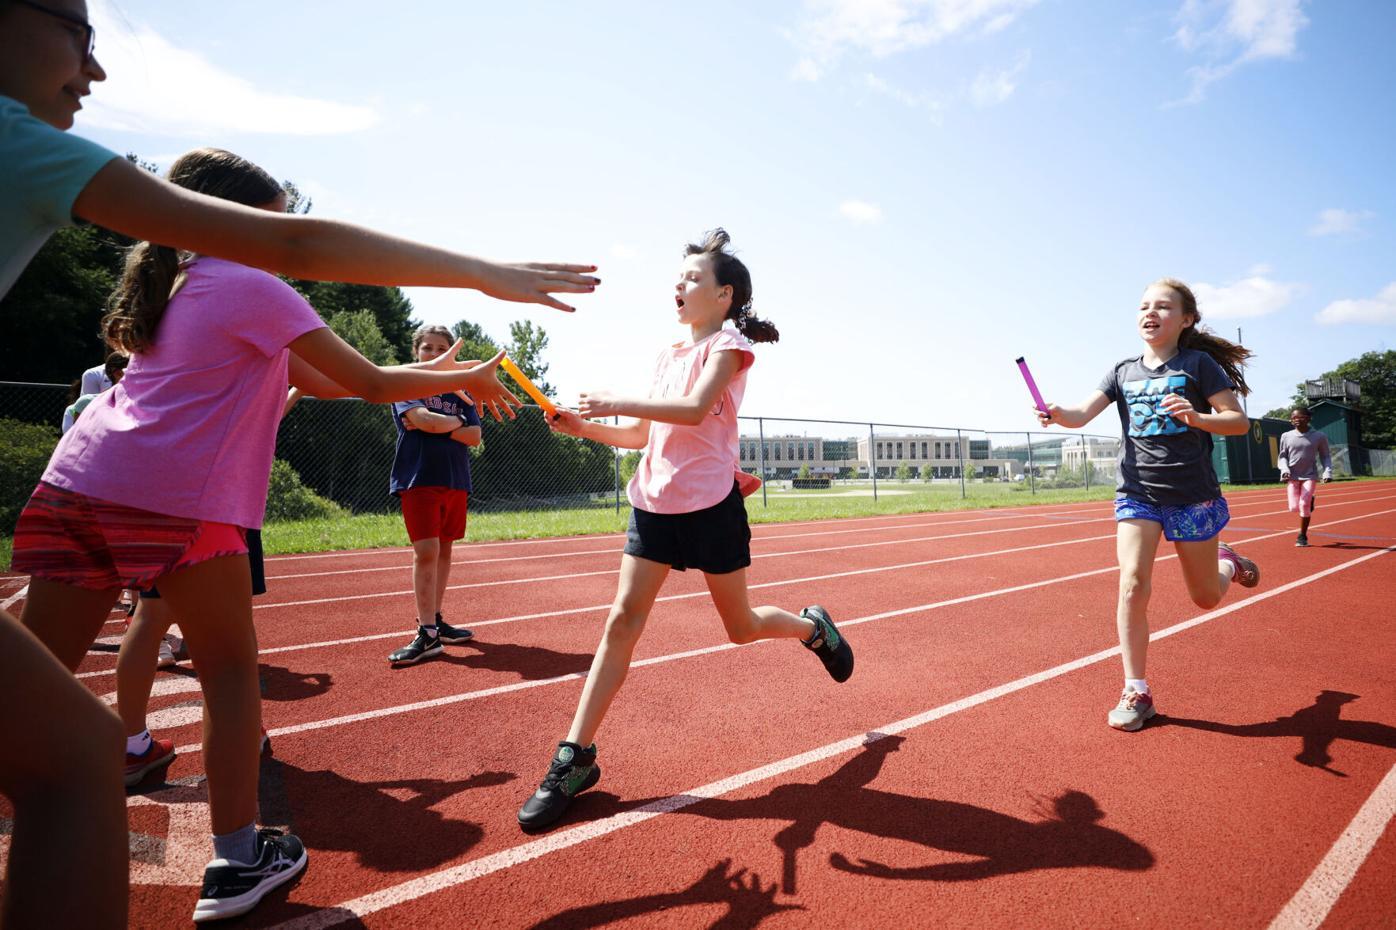 kids pass batons in relay race